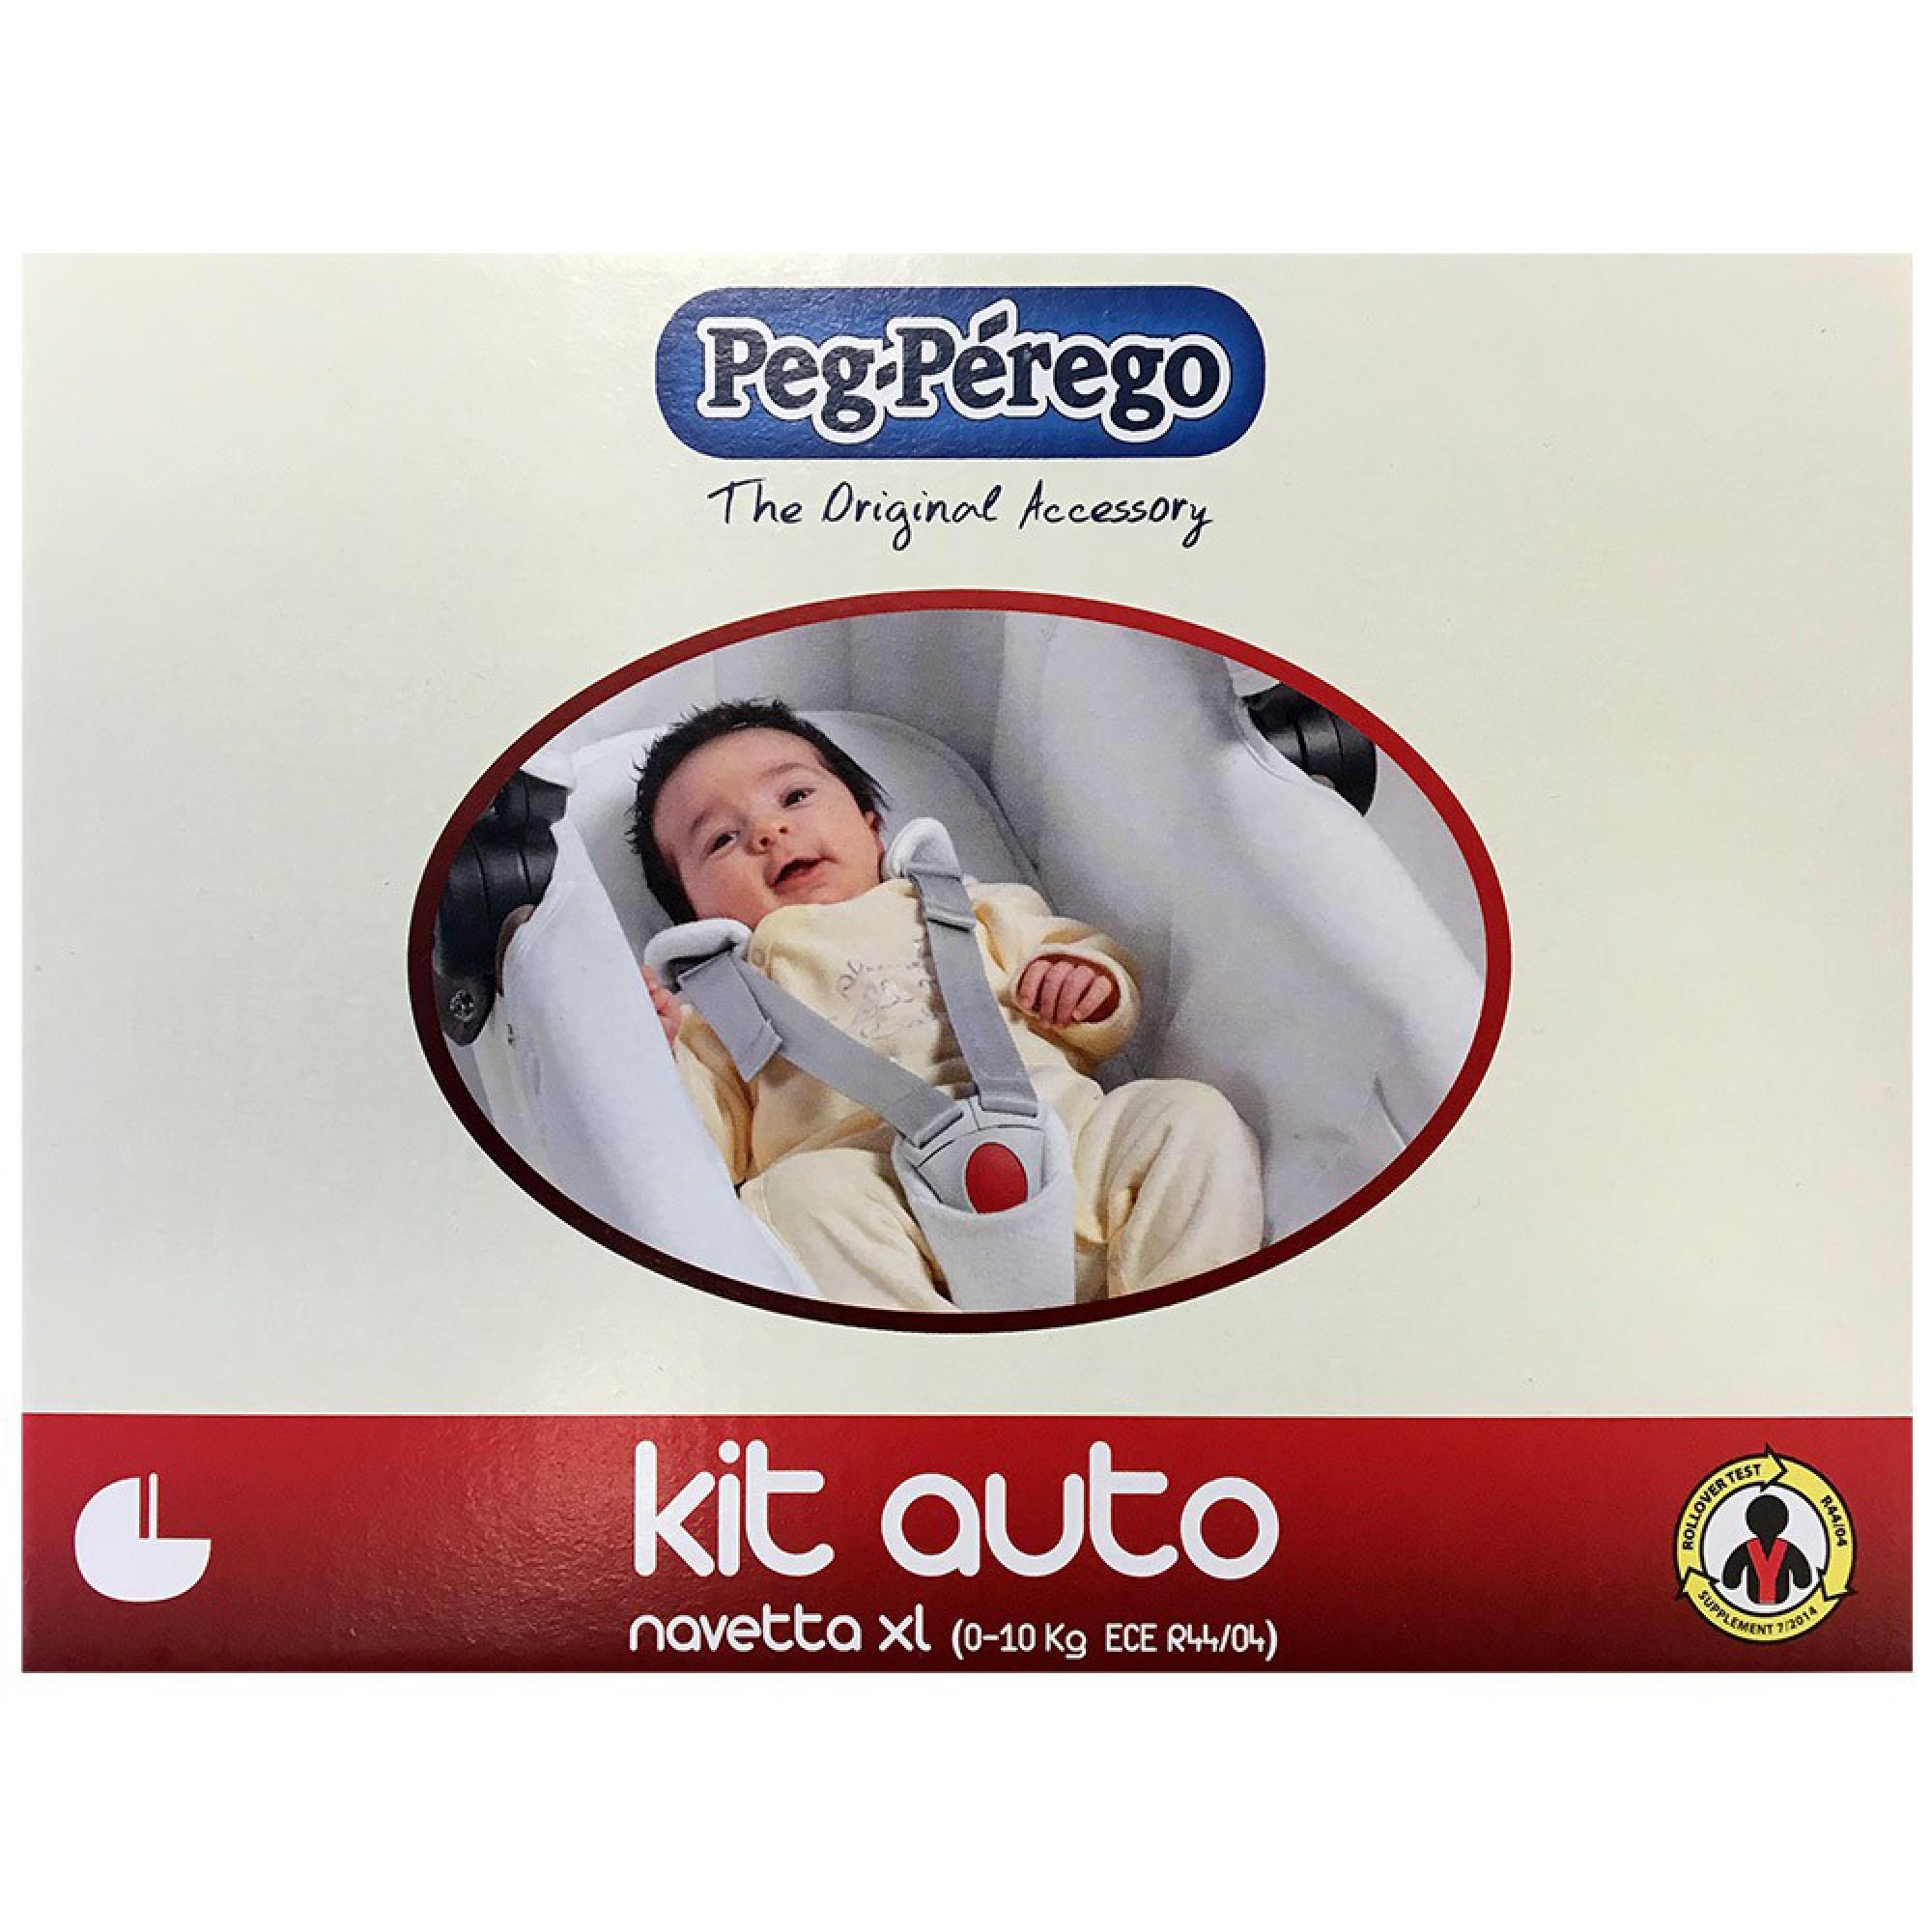 Kit Auto Pentru Landou Navetta XL, Peg Perego